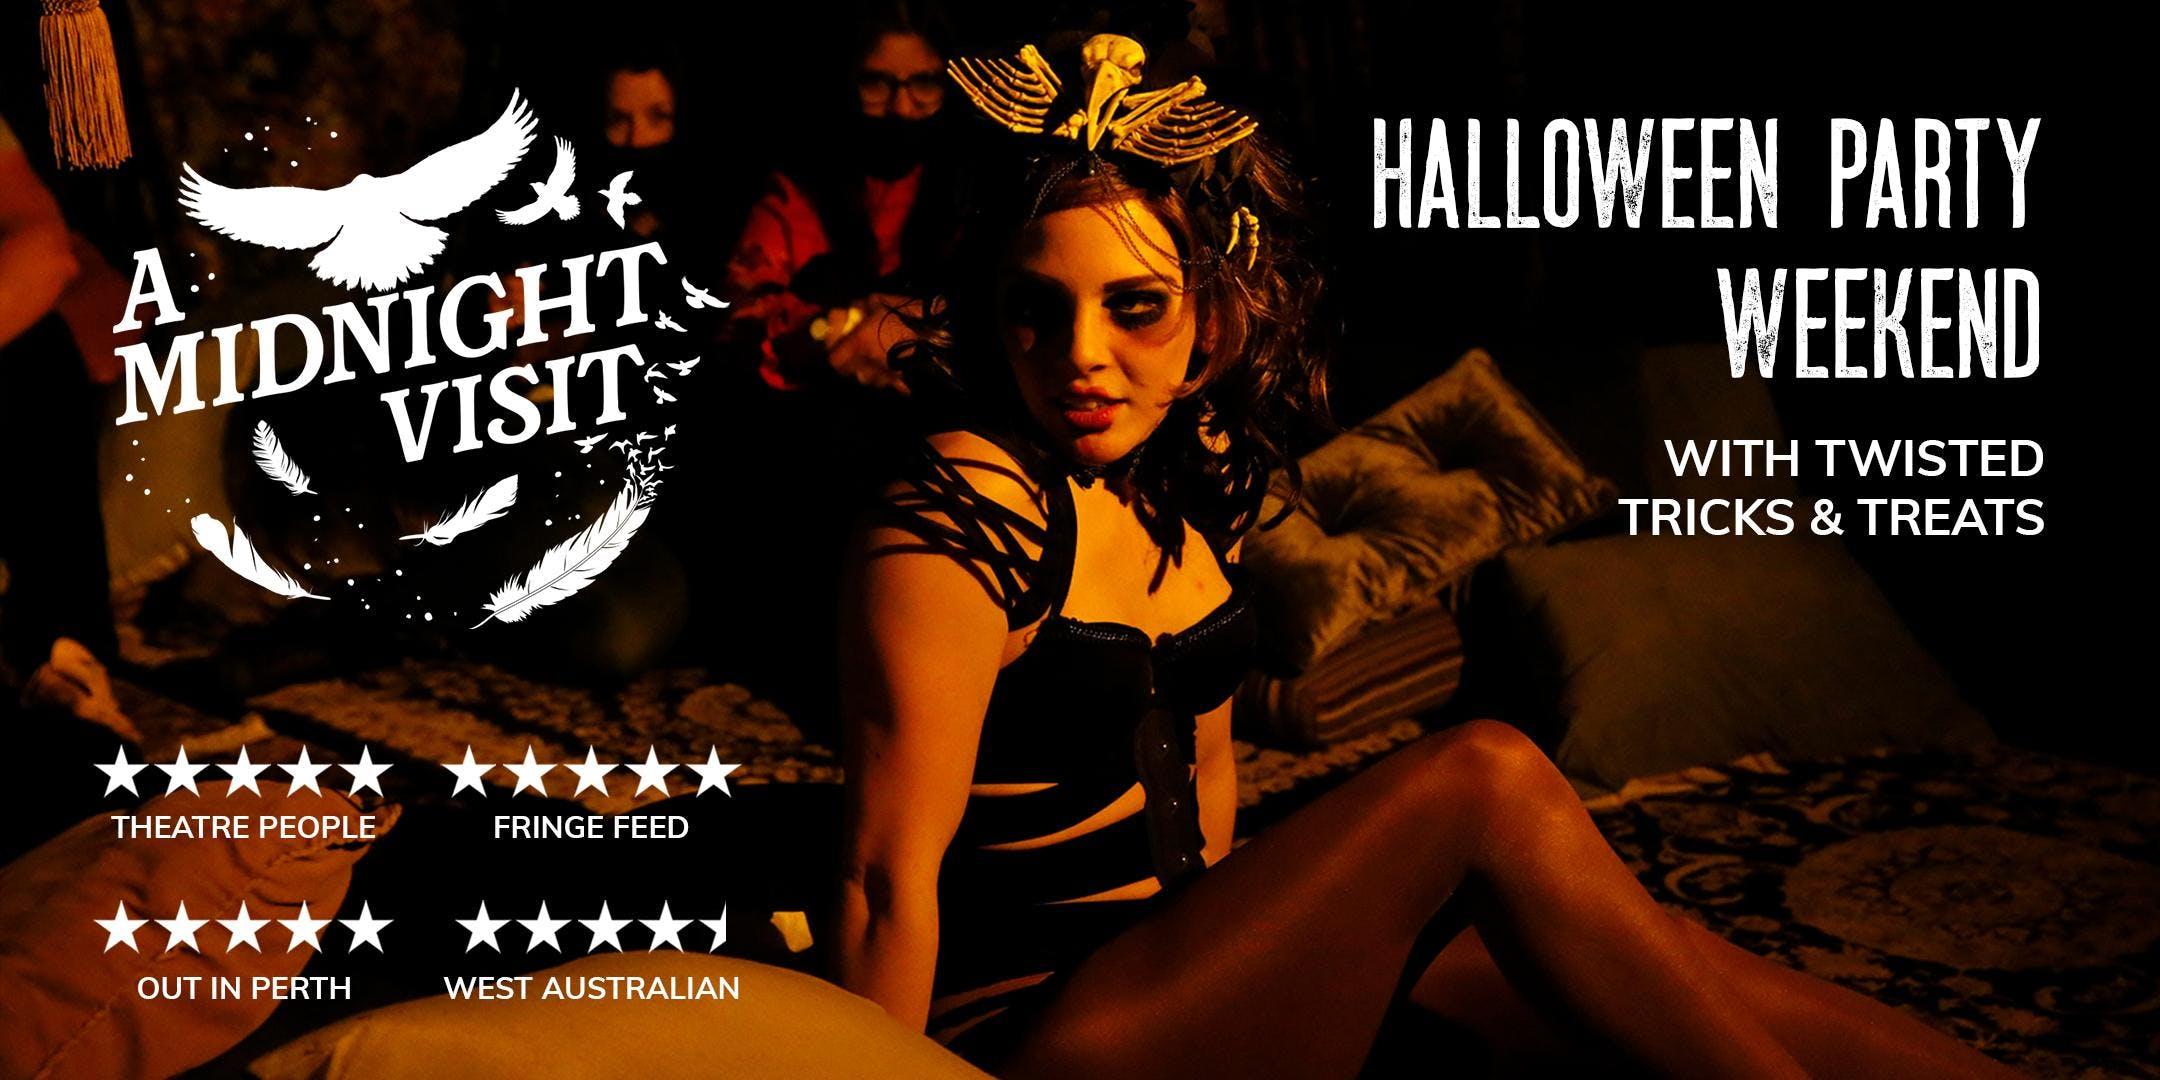 A Midnight Visit  HALLOWEEN PARTY Thurs 31 Oct